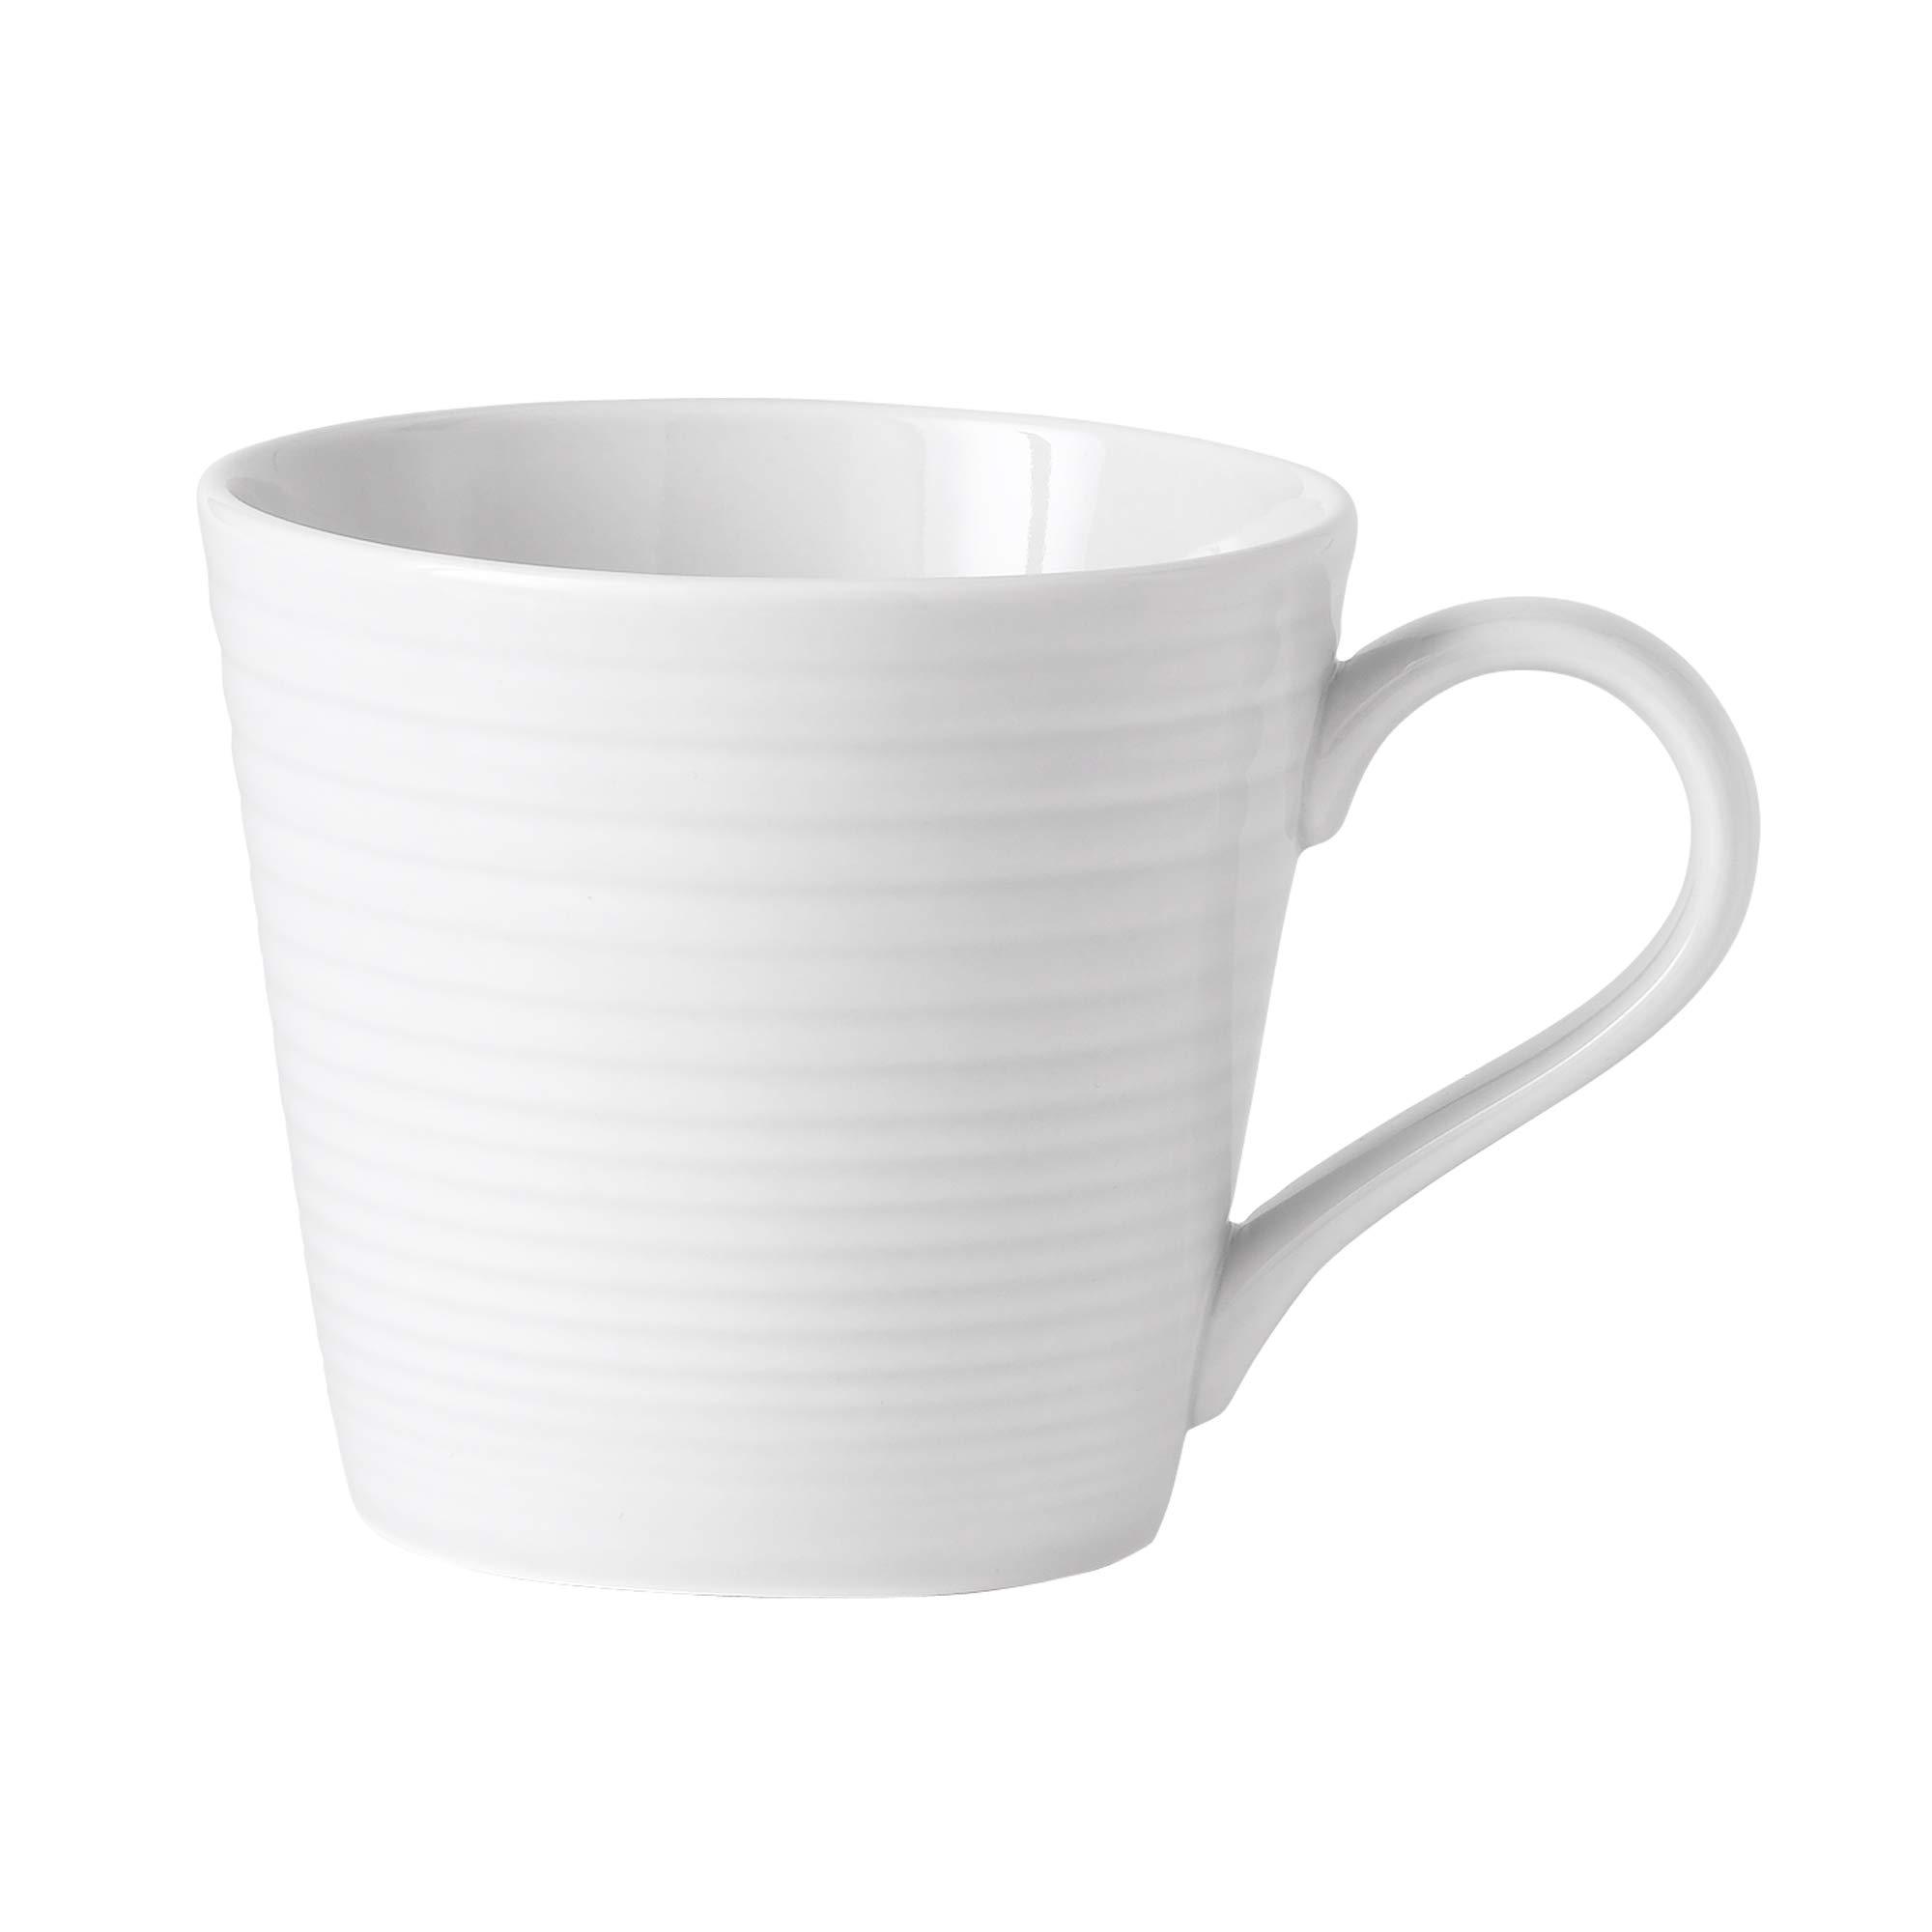 Gordon Ramsay Maze White Dinneware Mug 14 Oz